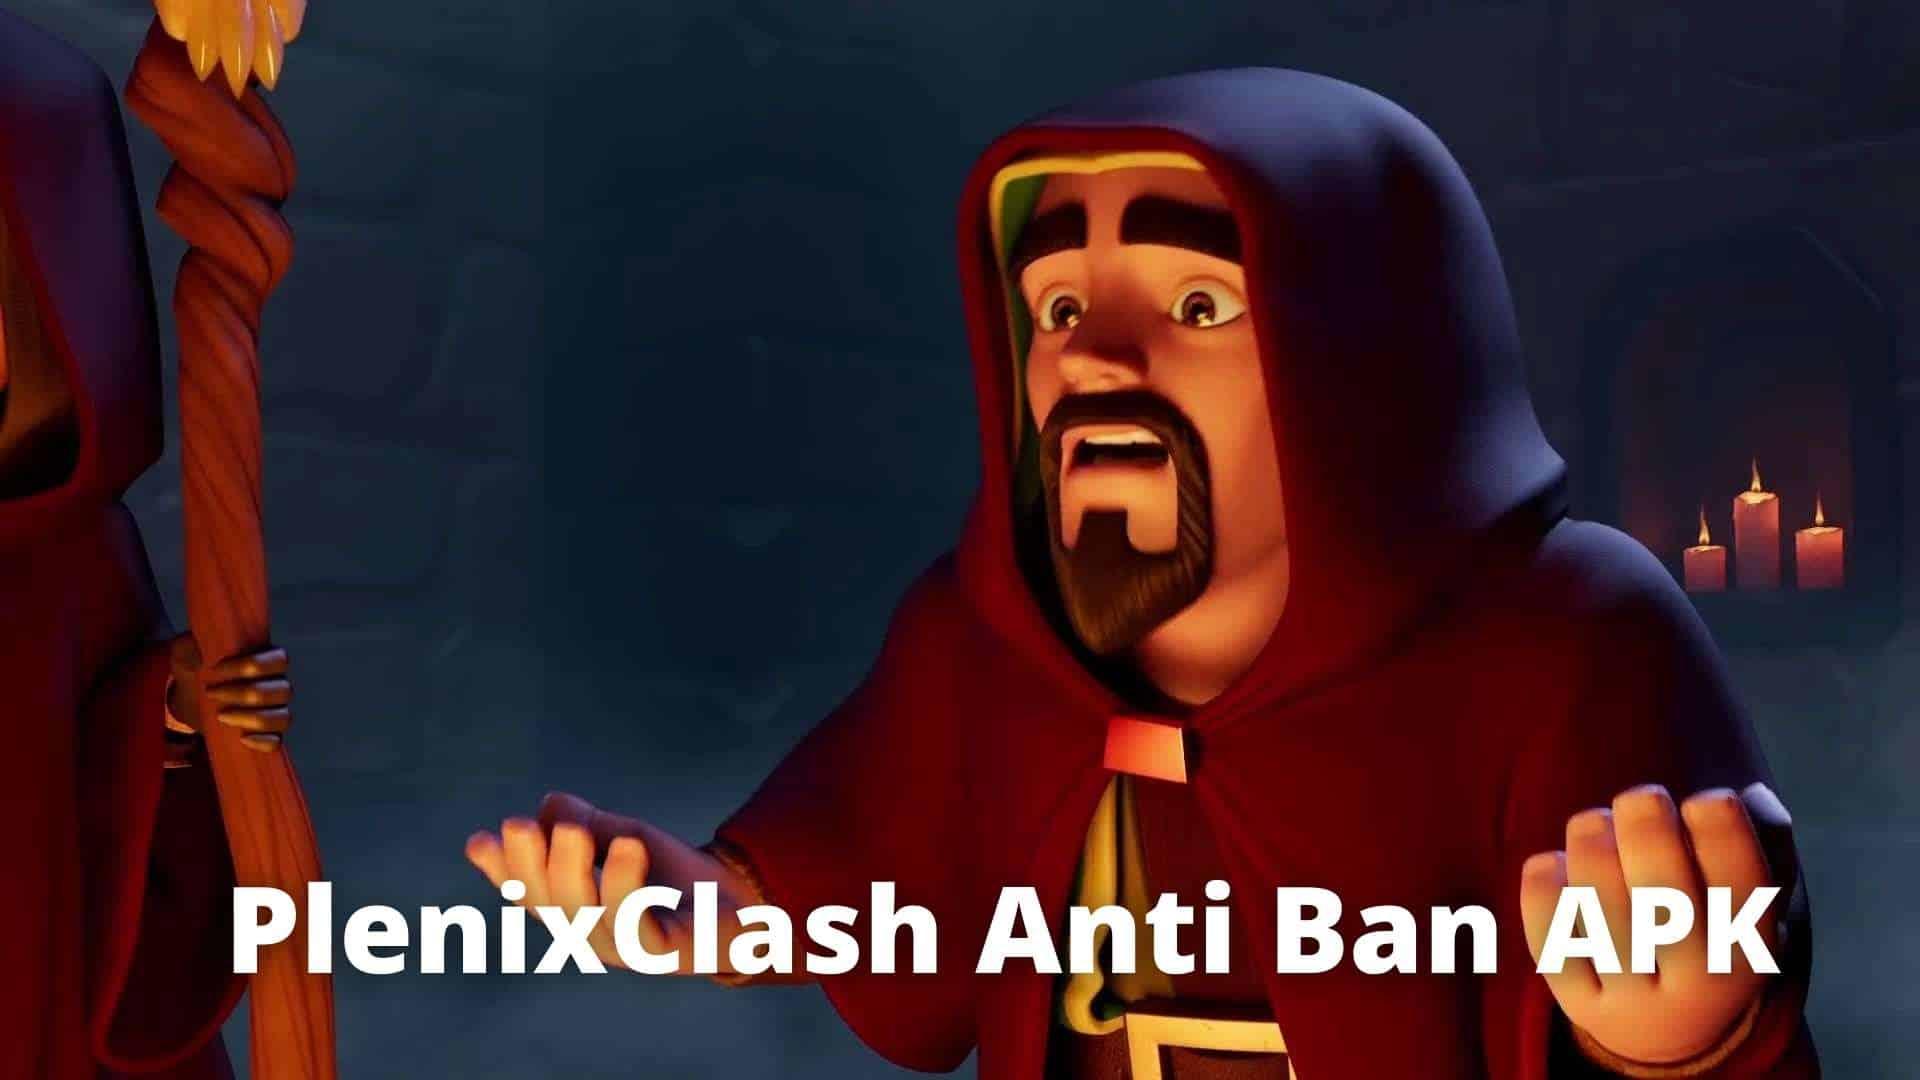 plenixclash anti ban apk